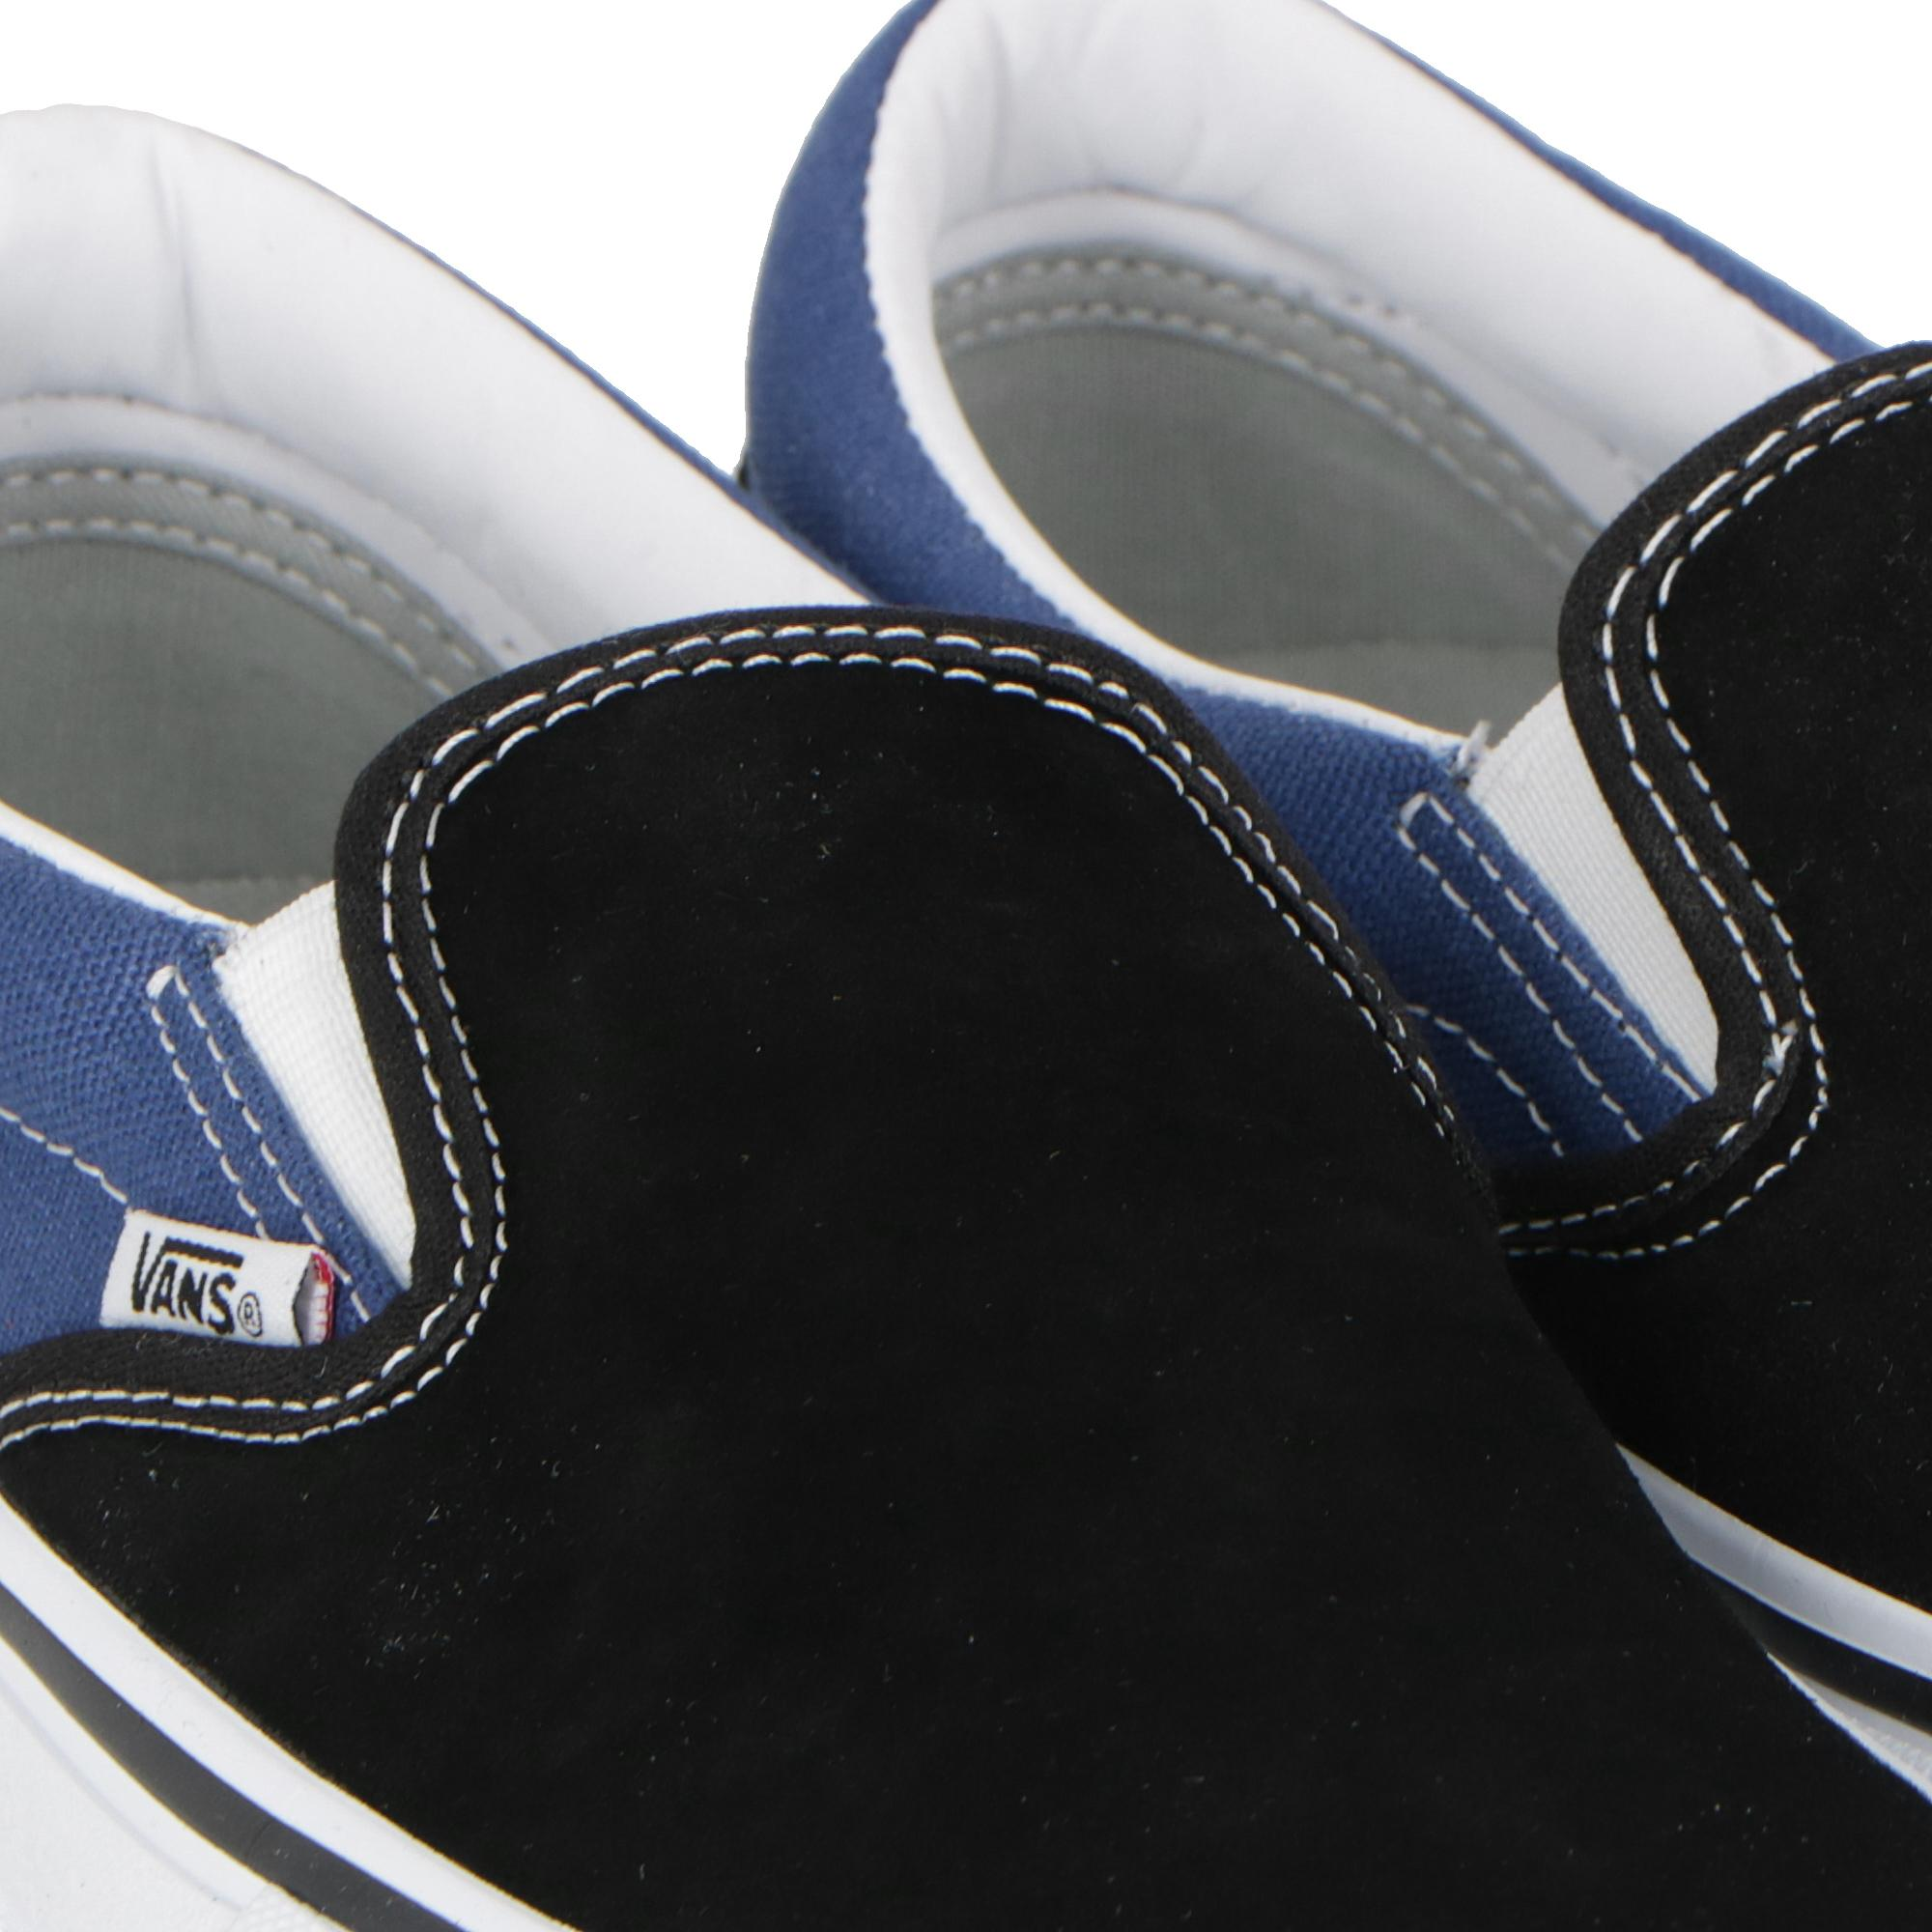 Vans X Anti Hero Slip-on Pro Pfanner black